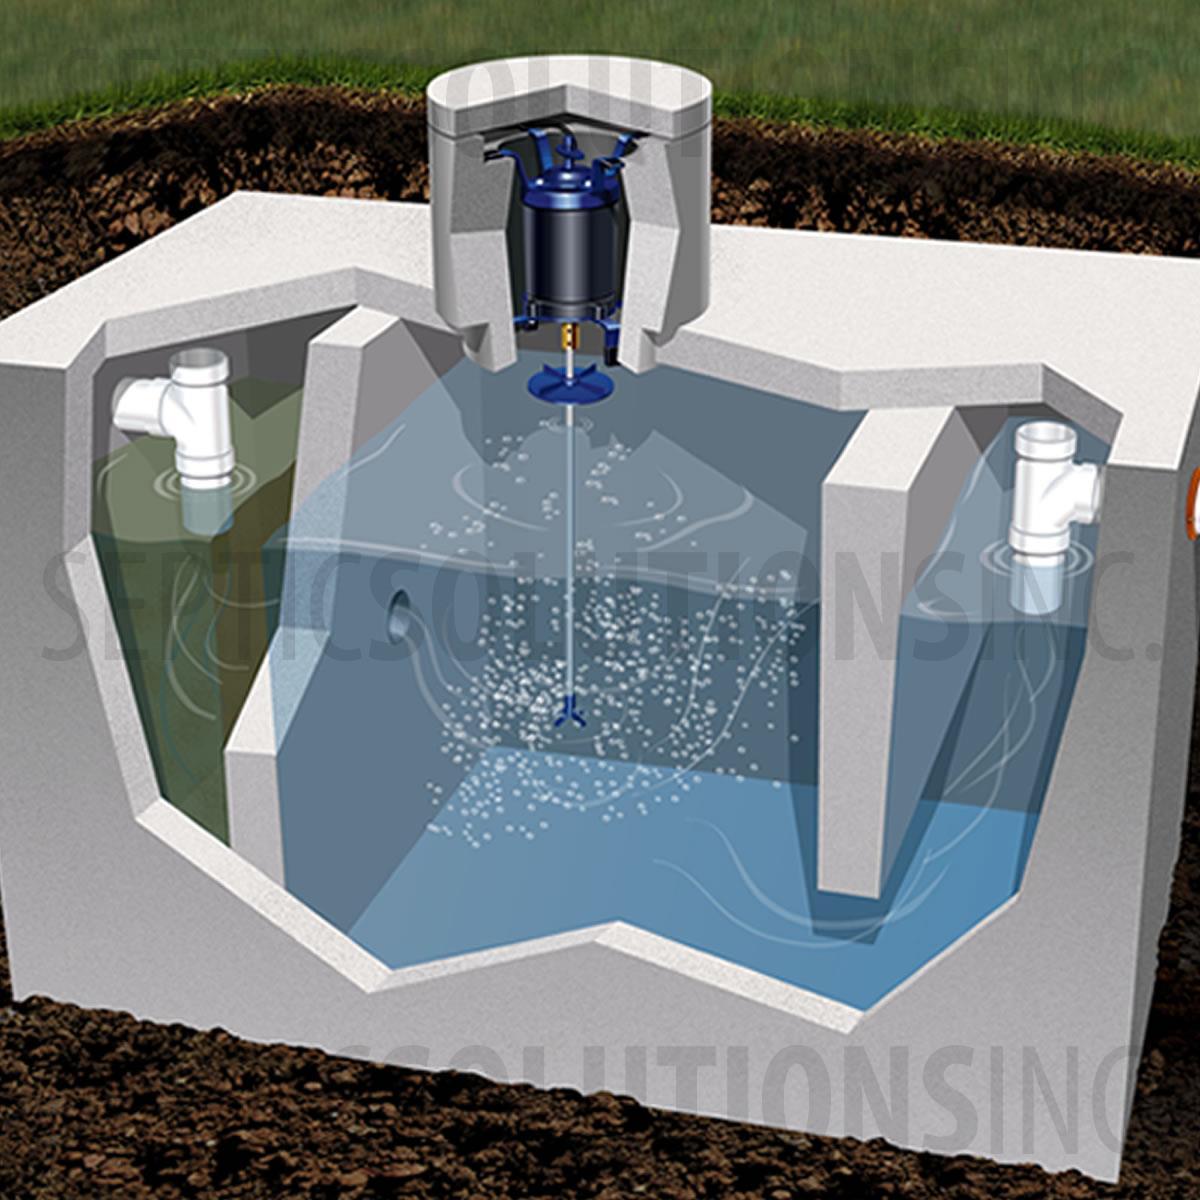 Ultra air model 735 blue flood resistant septic aerator for Jet septic aerator motor